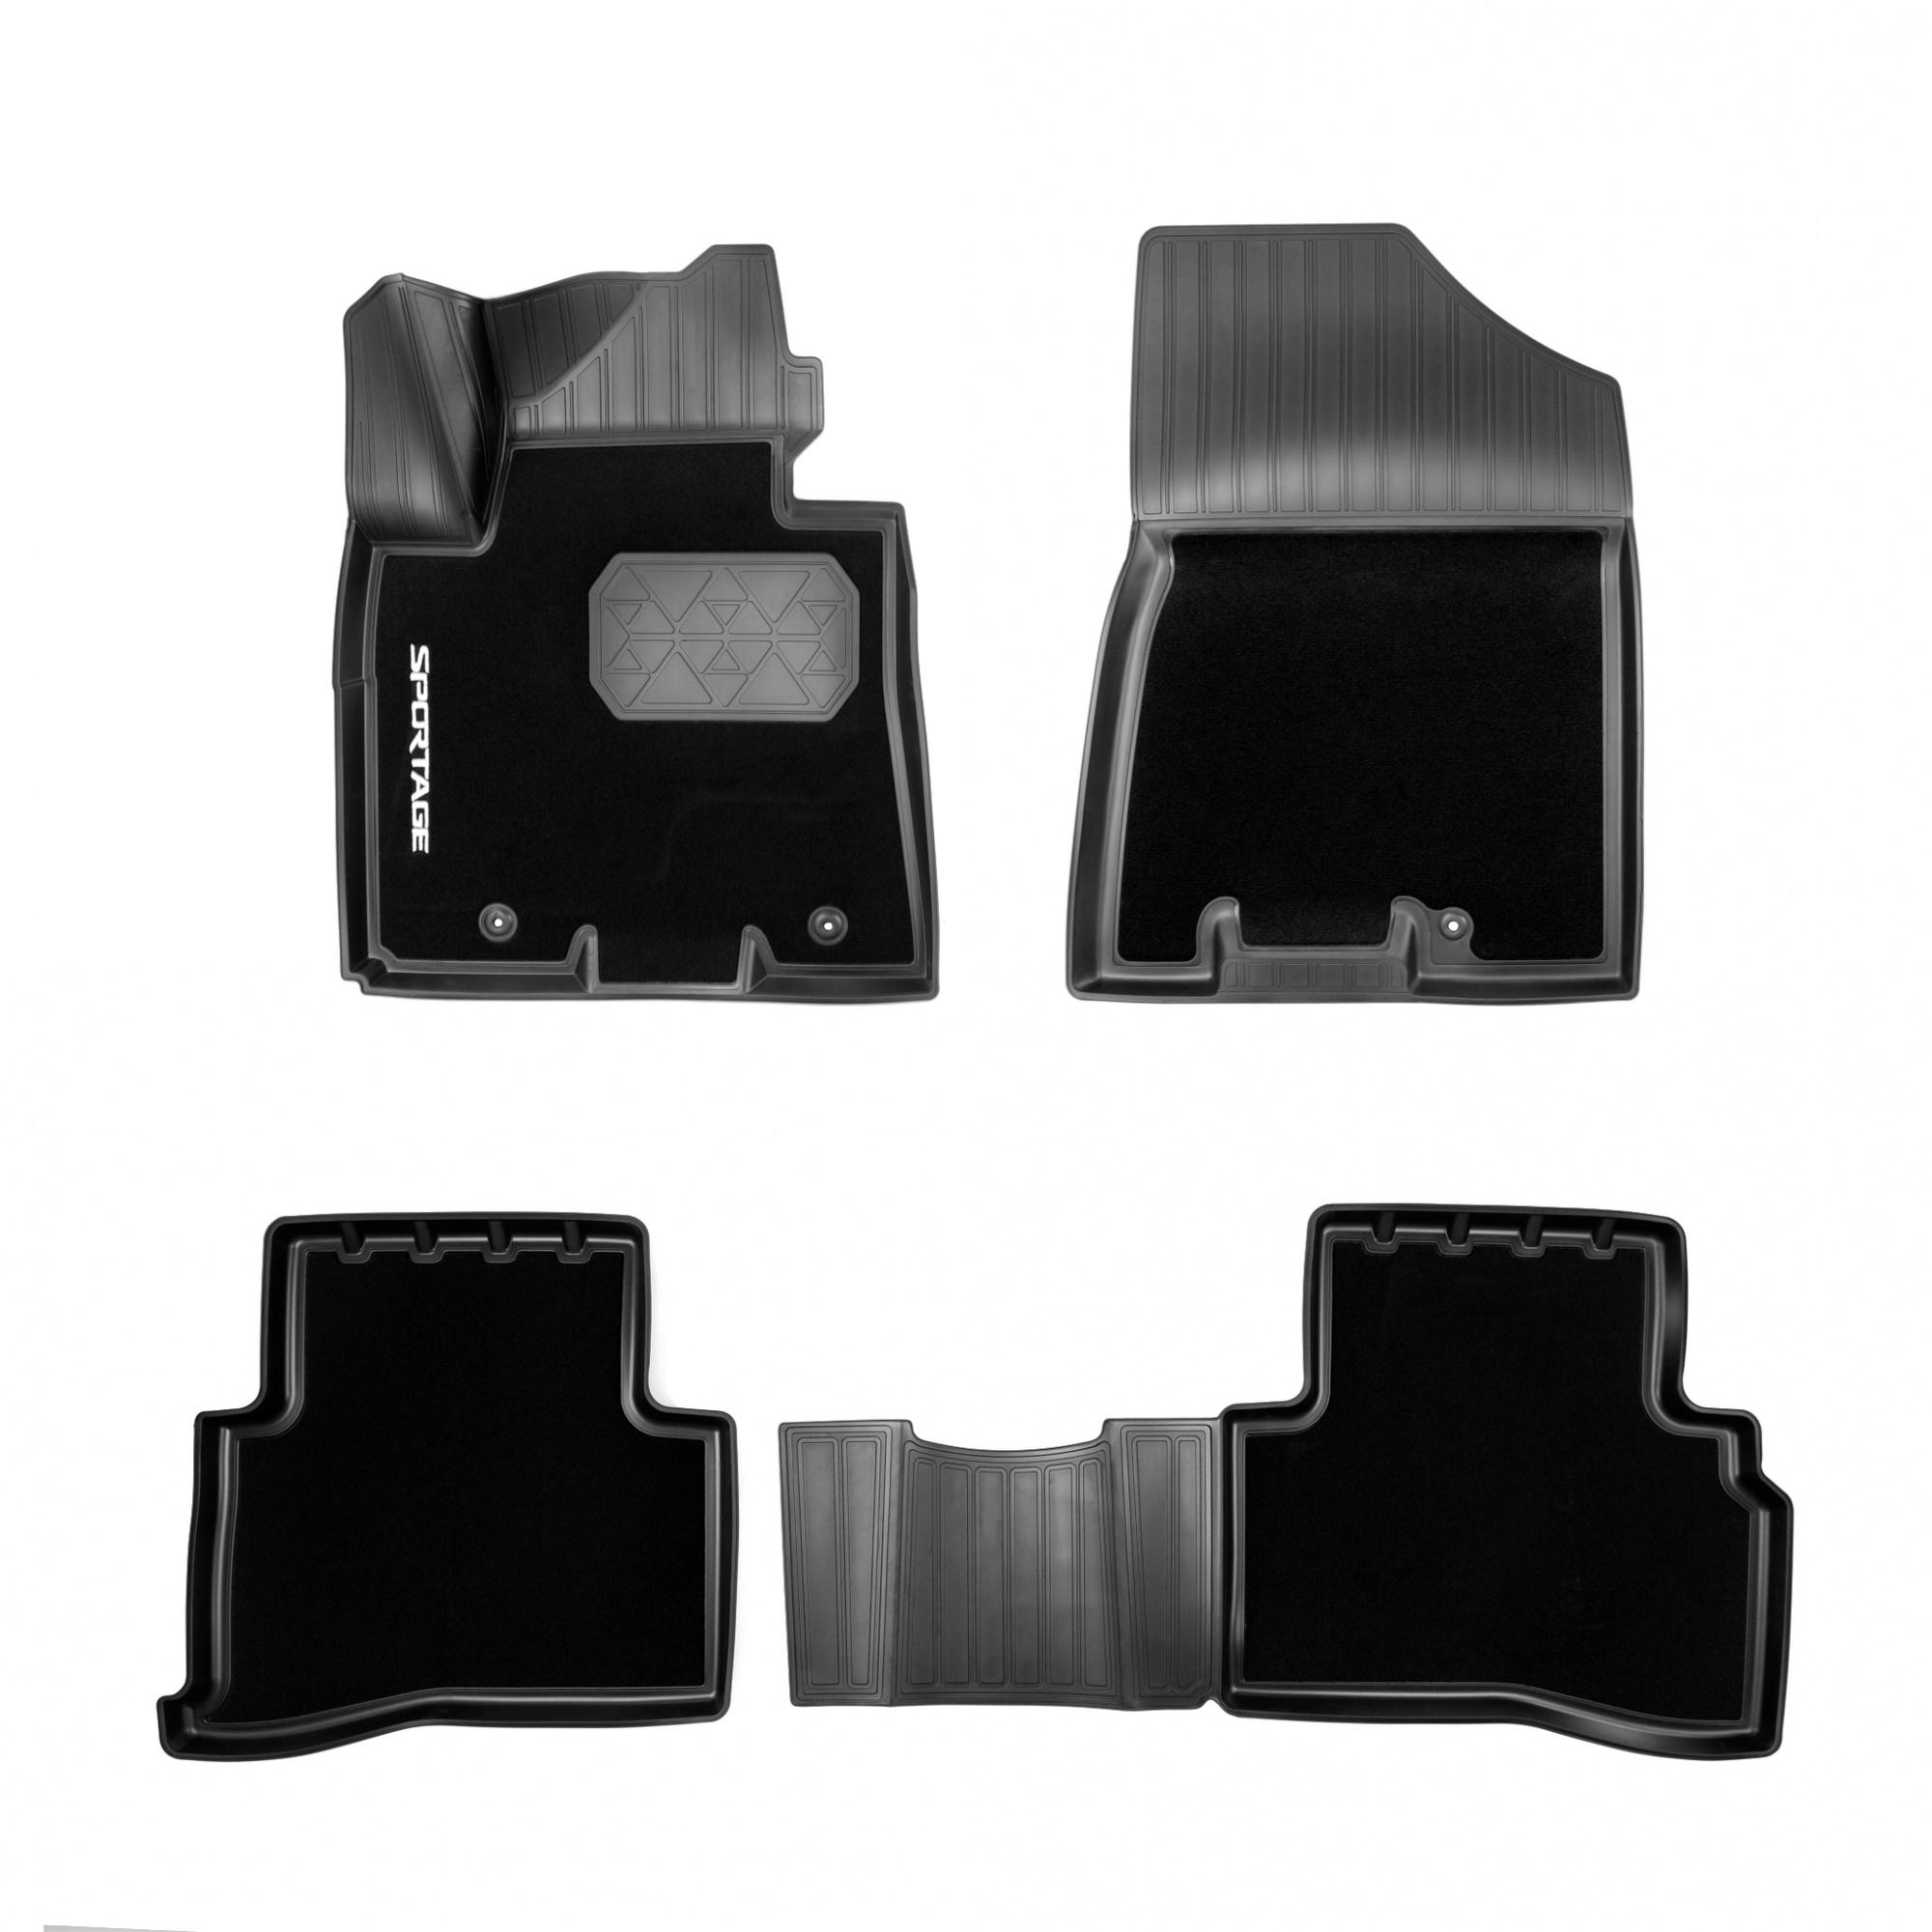 Коврики в салон Hyundai/Kia полиуретан черный R8130F1004 Kia Sportage (4G) рест. 2018- недорого